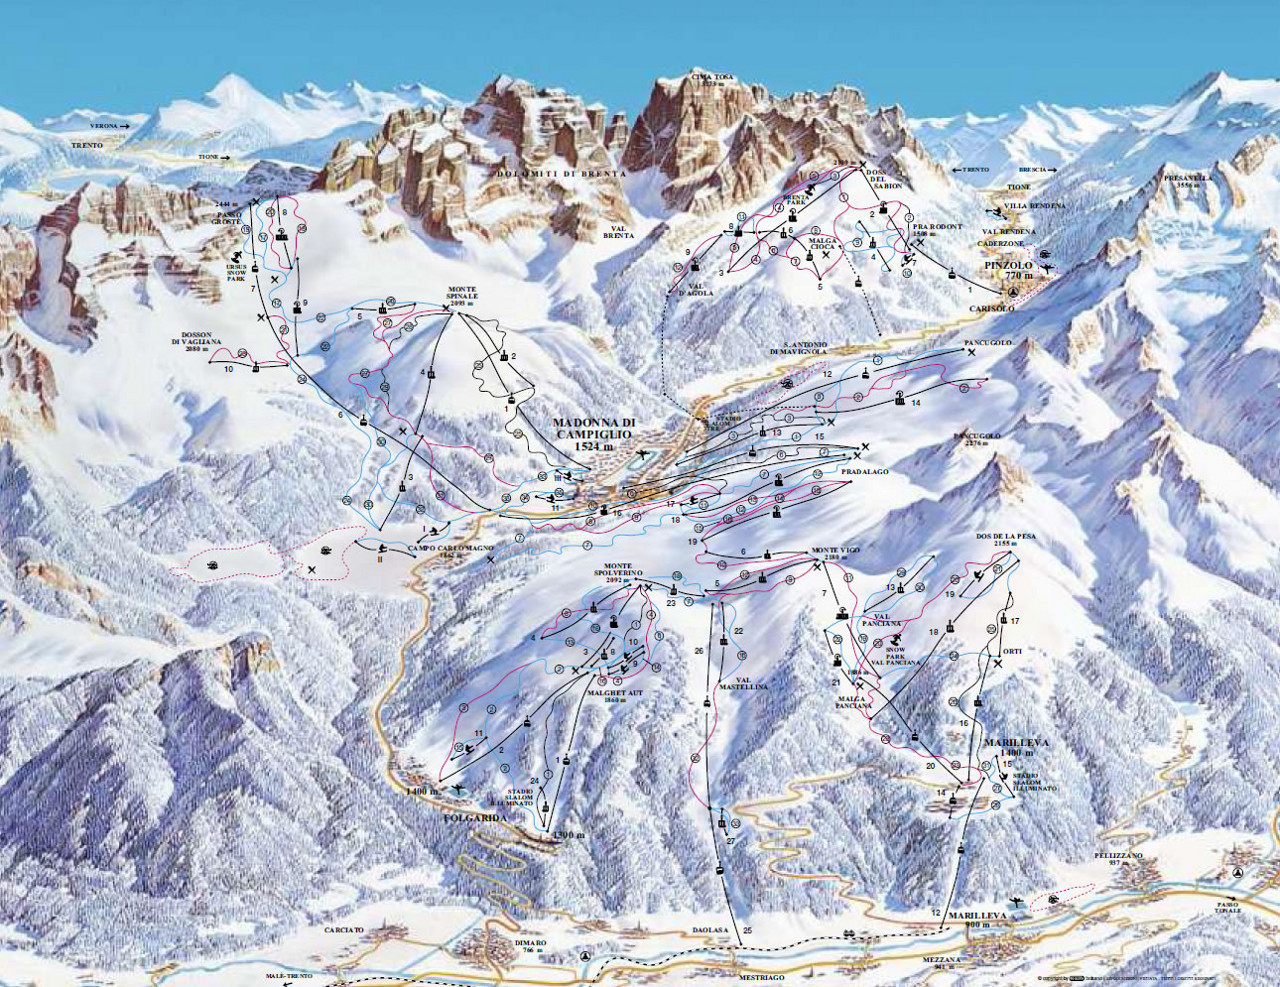 Lyžařská mapa sjezdovek areálu Madonna di Campiglio / Pinzolo / Folgarida - Marilléva